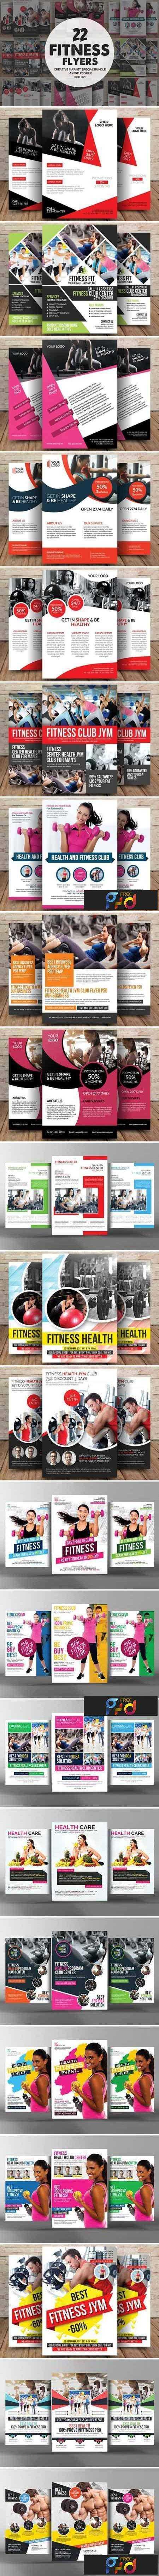 1708118 22 Fitness Flyers Bundle 1833507 1